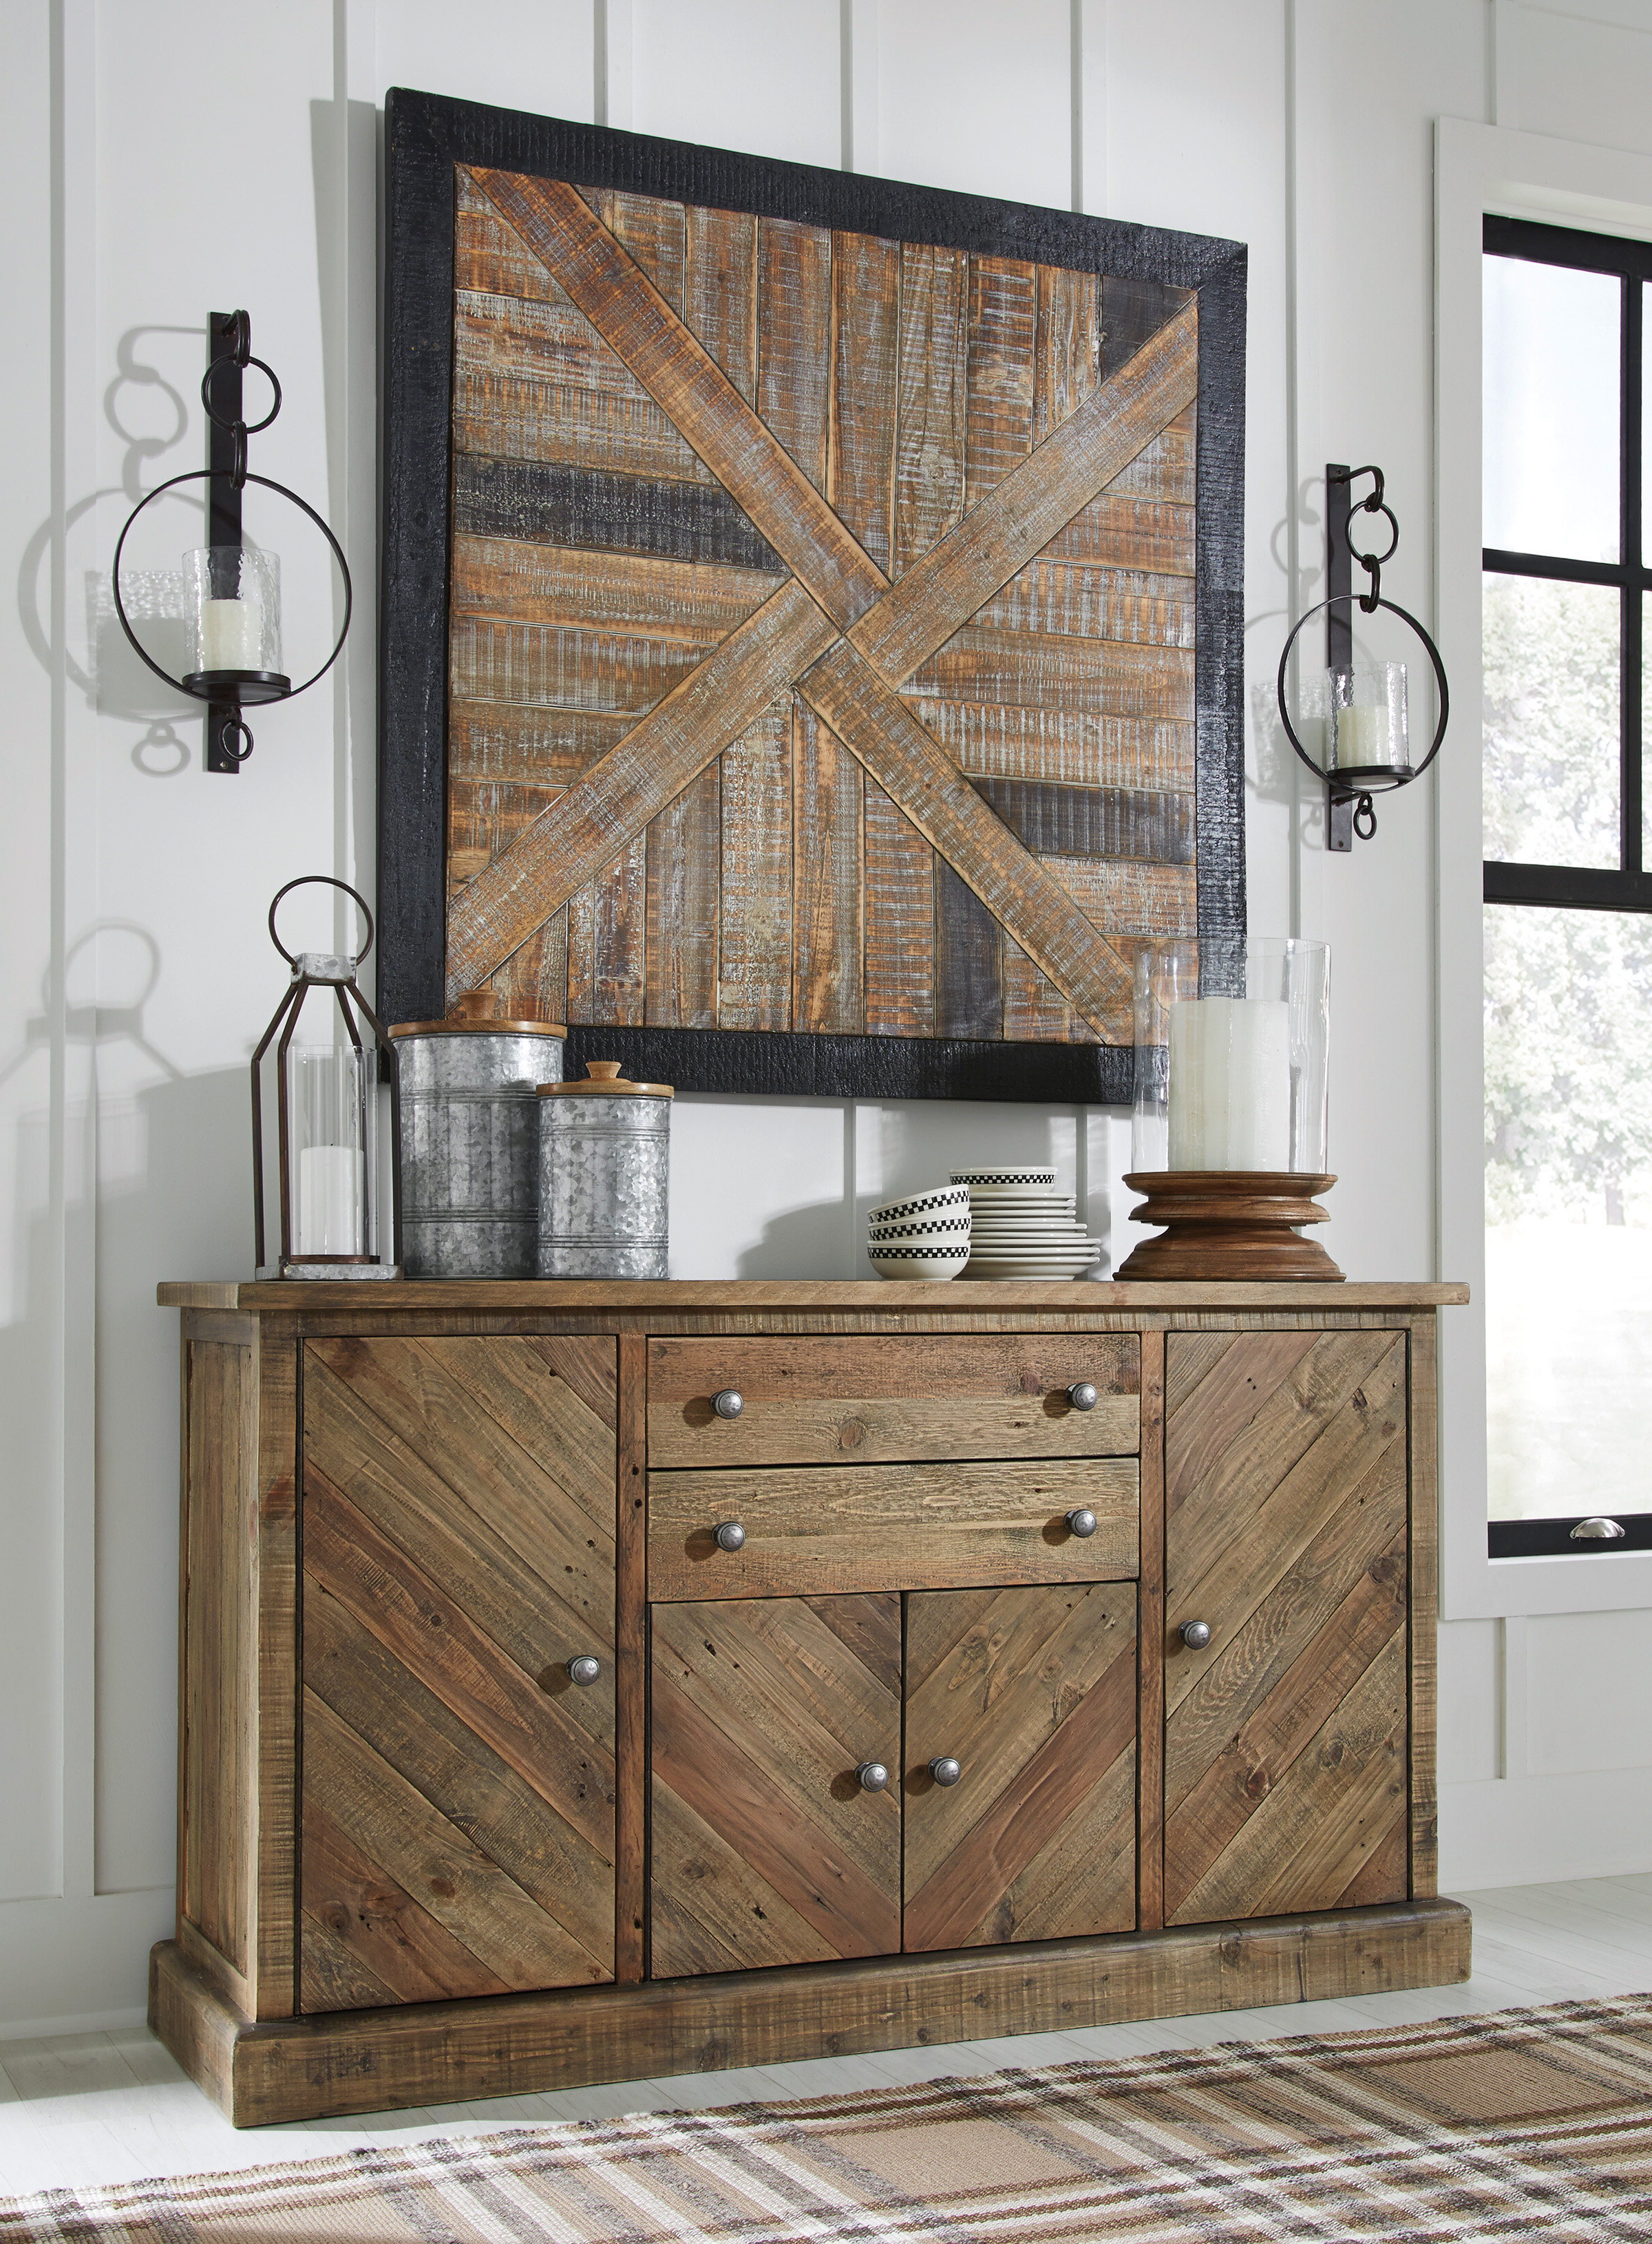 Sideboards & Buffet Tables | Joss & Main In Whitten Sideboards (View 18 of 20)